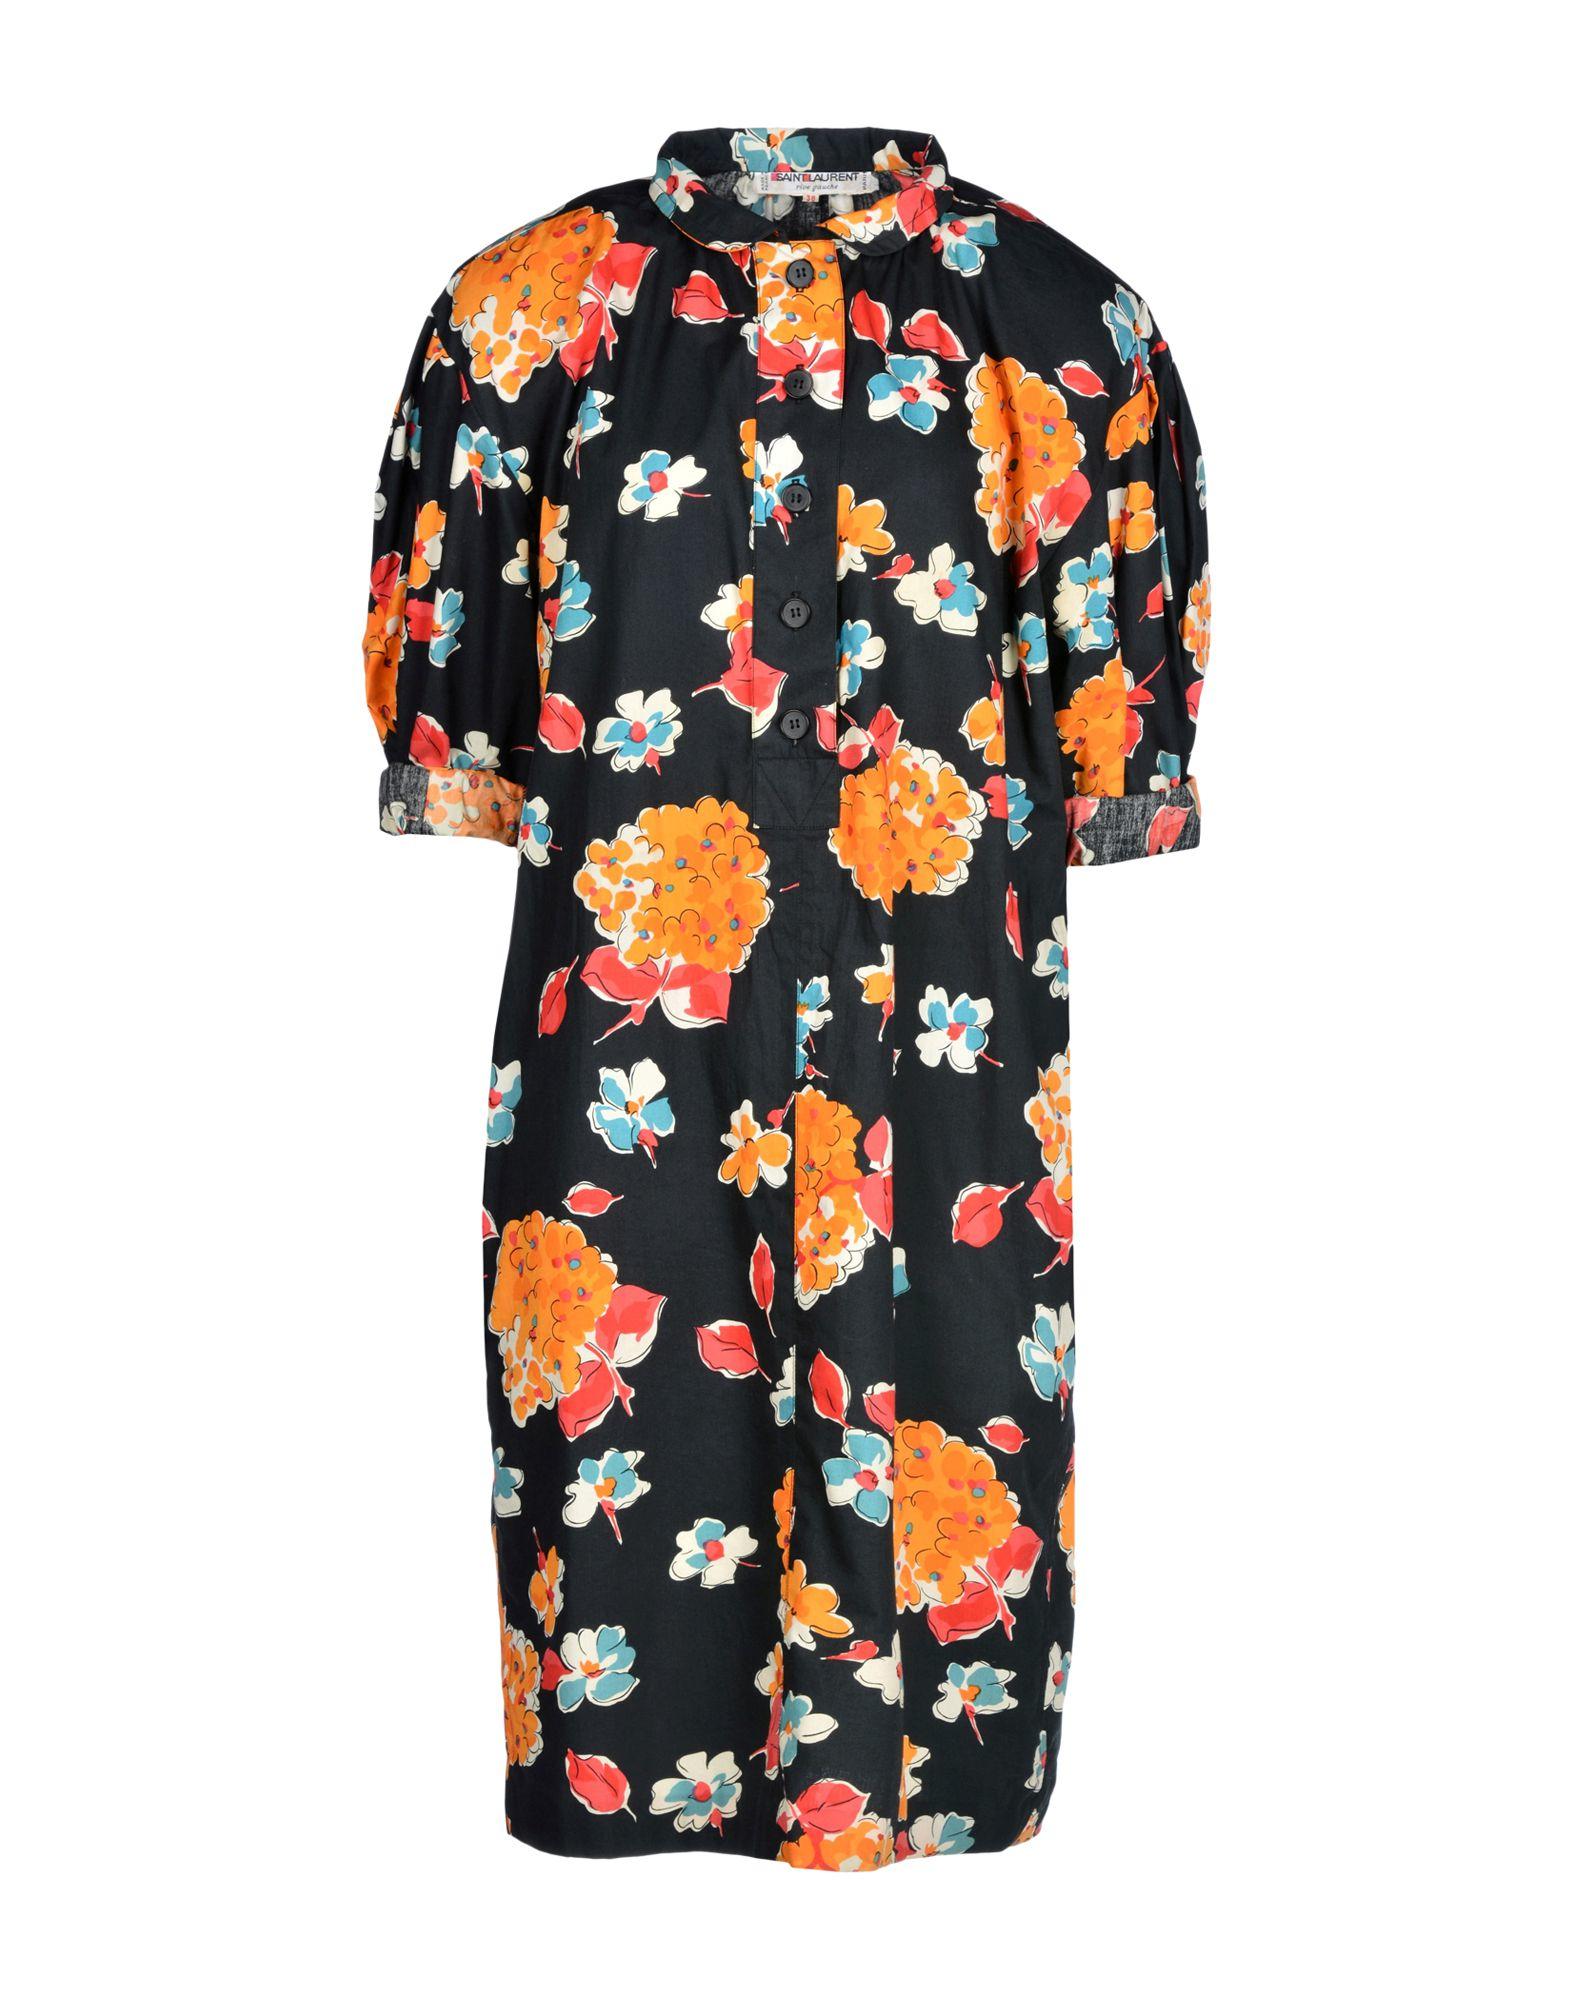 Yves Saint Laurent Rive Gauche Clothing | Lyst?